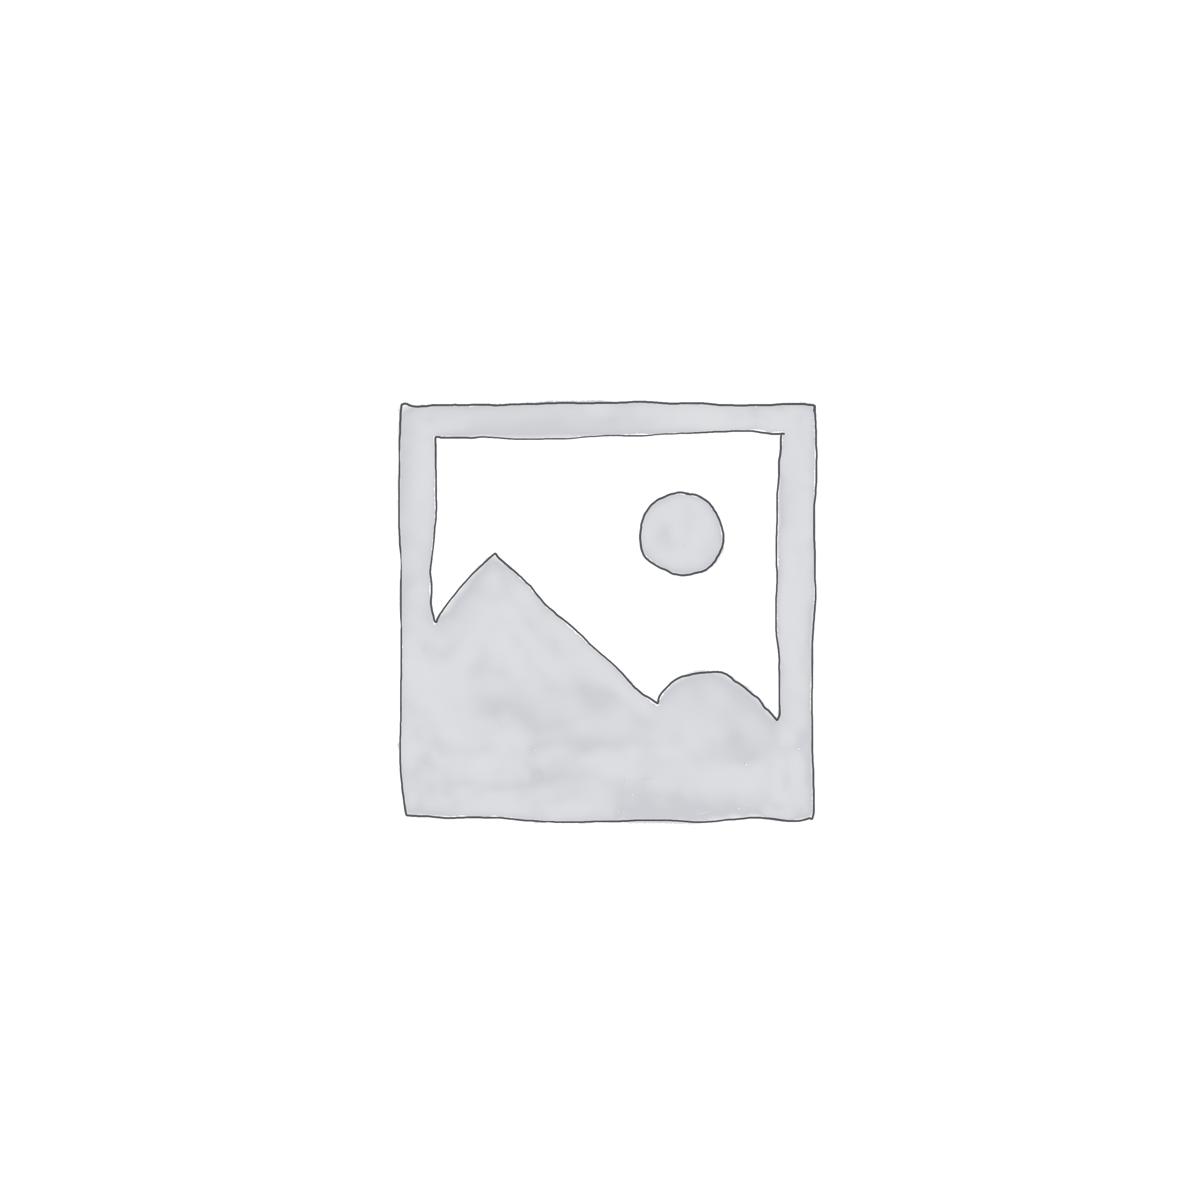 Highway on the Forest Landscape Wallpaper Mural